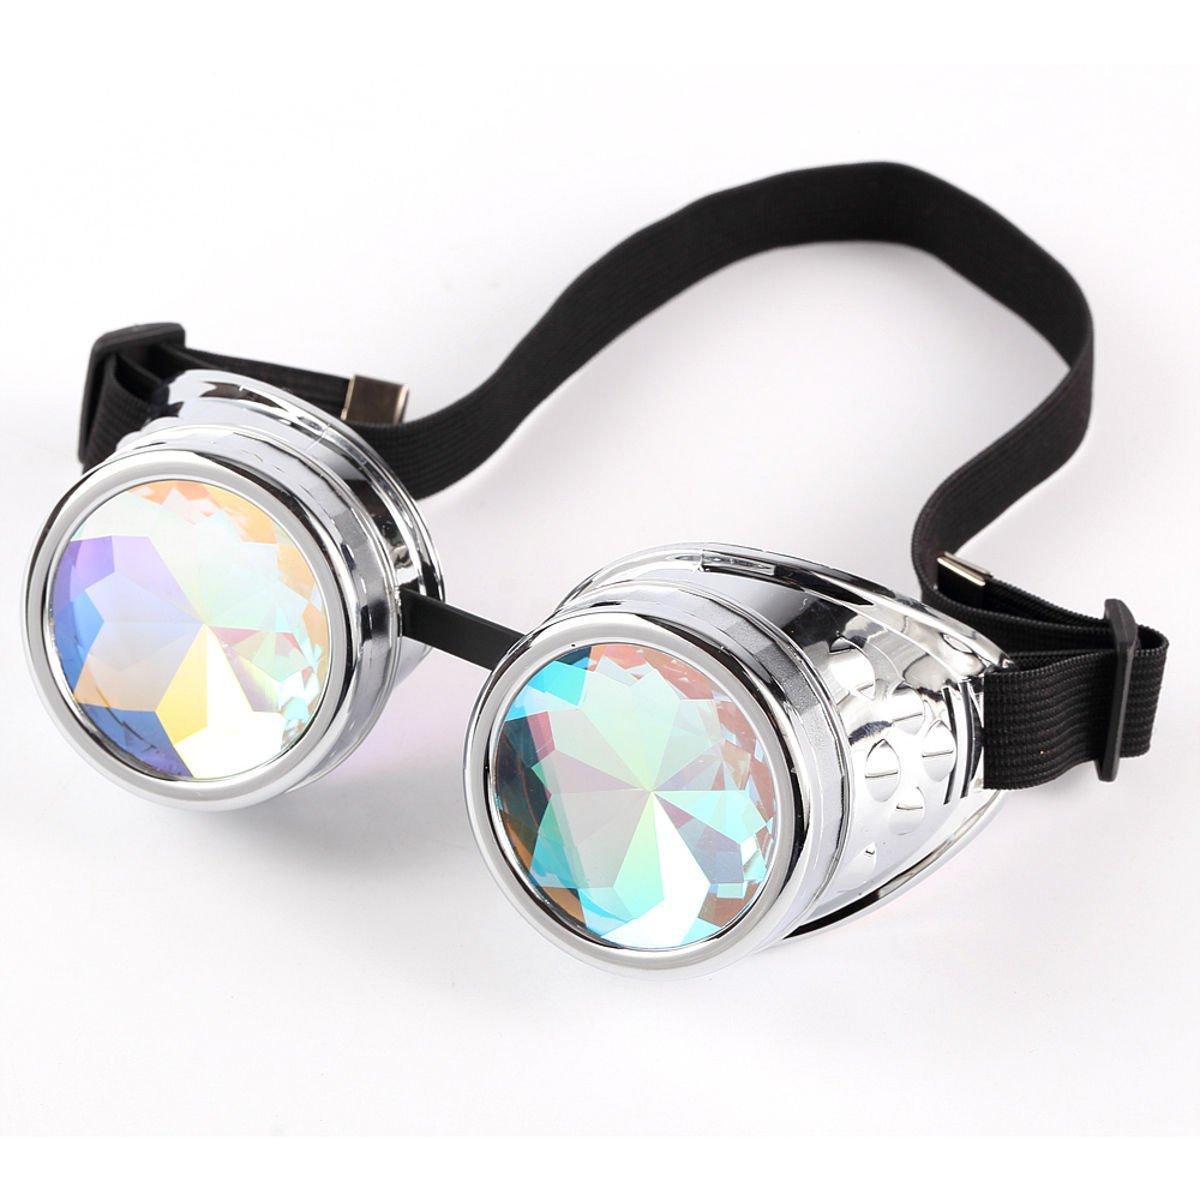 Wosonku Festivals Rave Kaleidoscope Rainbow Glasses Prism Diffraction Crystal Lense